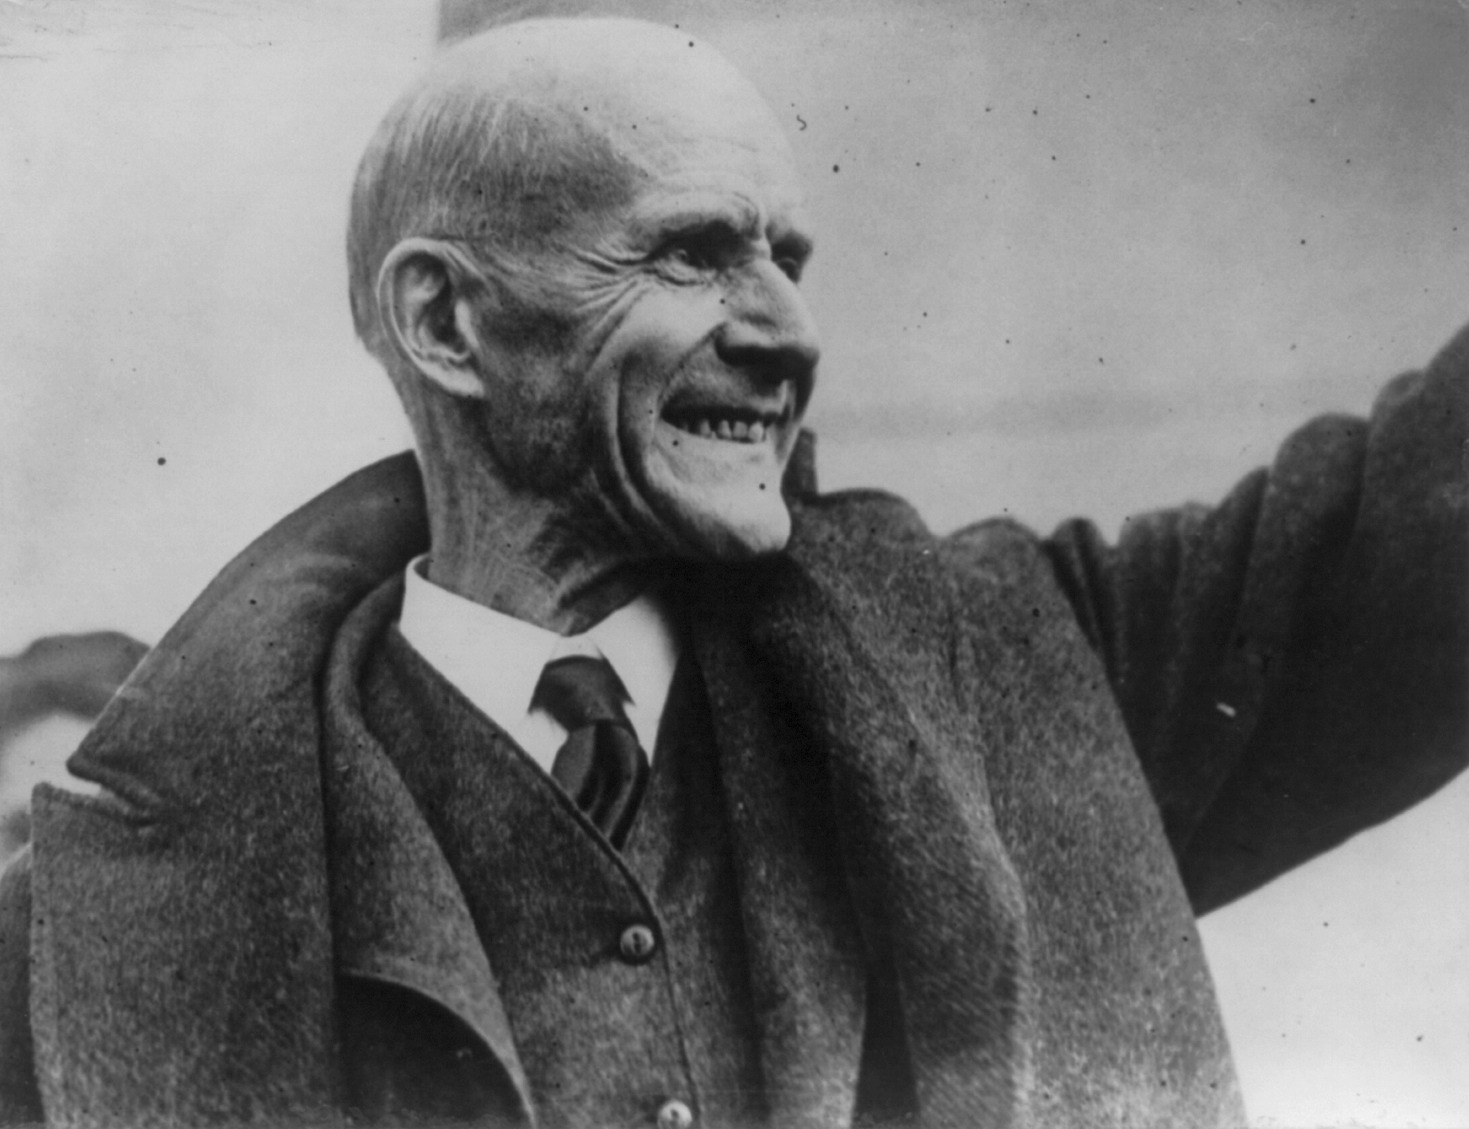 Eugene_Debs_released_from_prison_1921.jpg